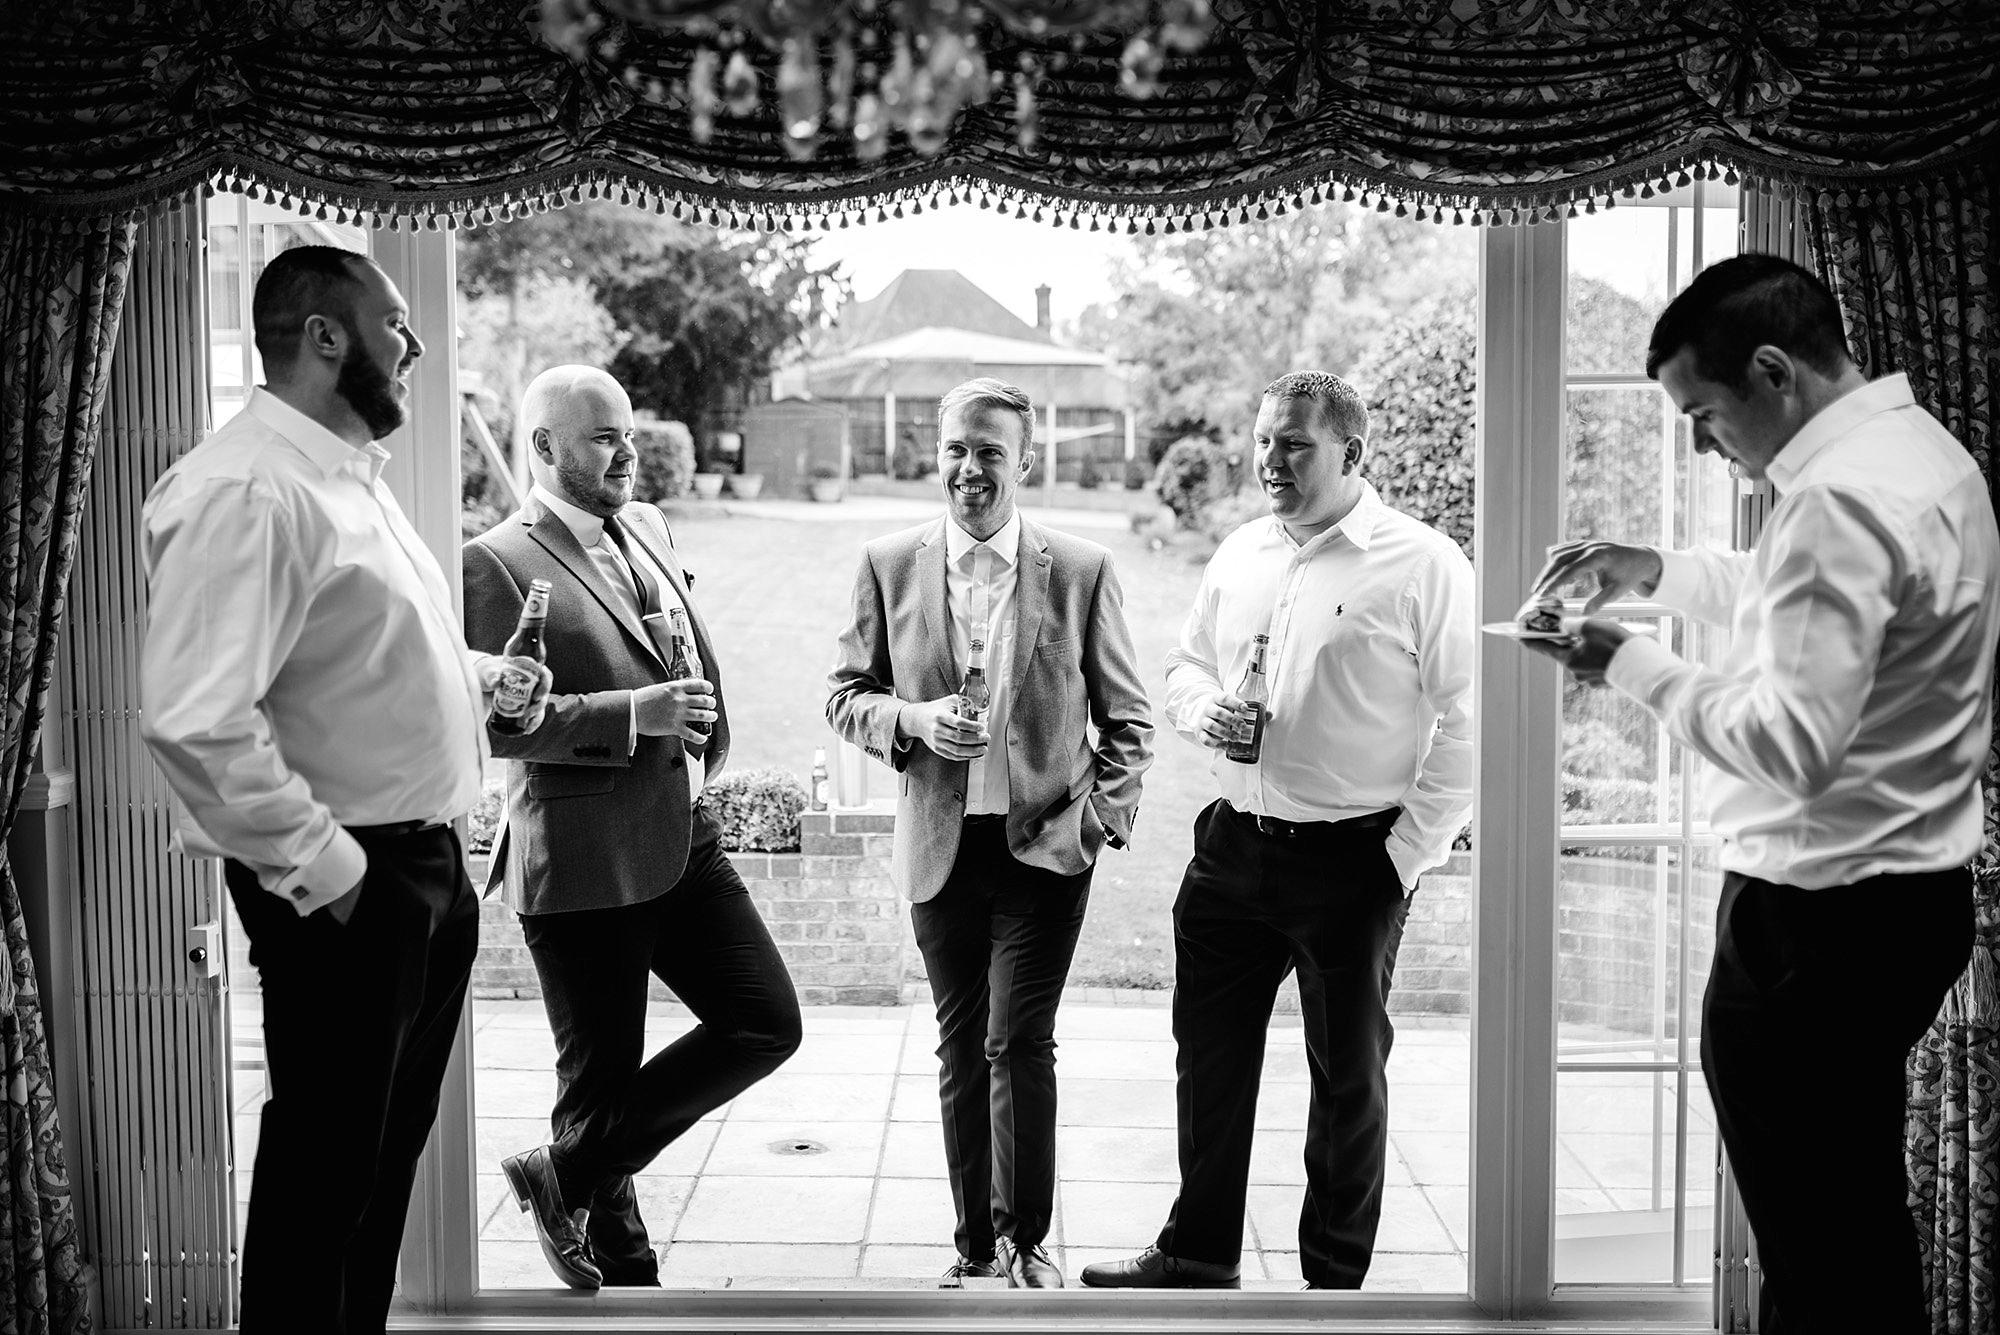 Fun London Wedding groomsmen chat together while getting ready ahead of brixton wedding